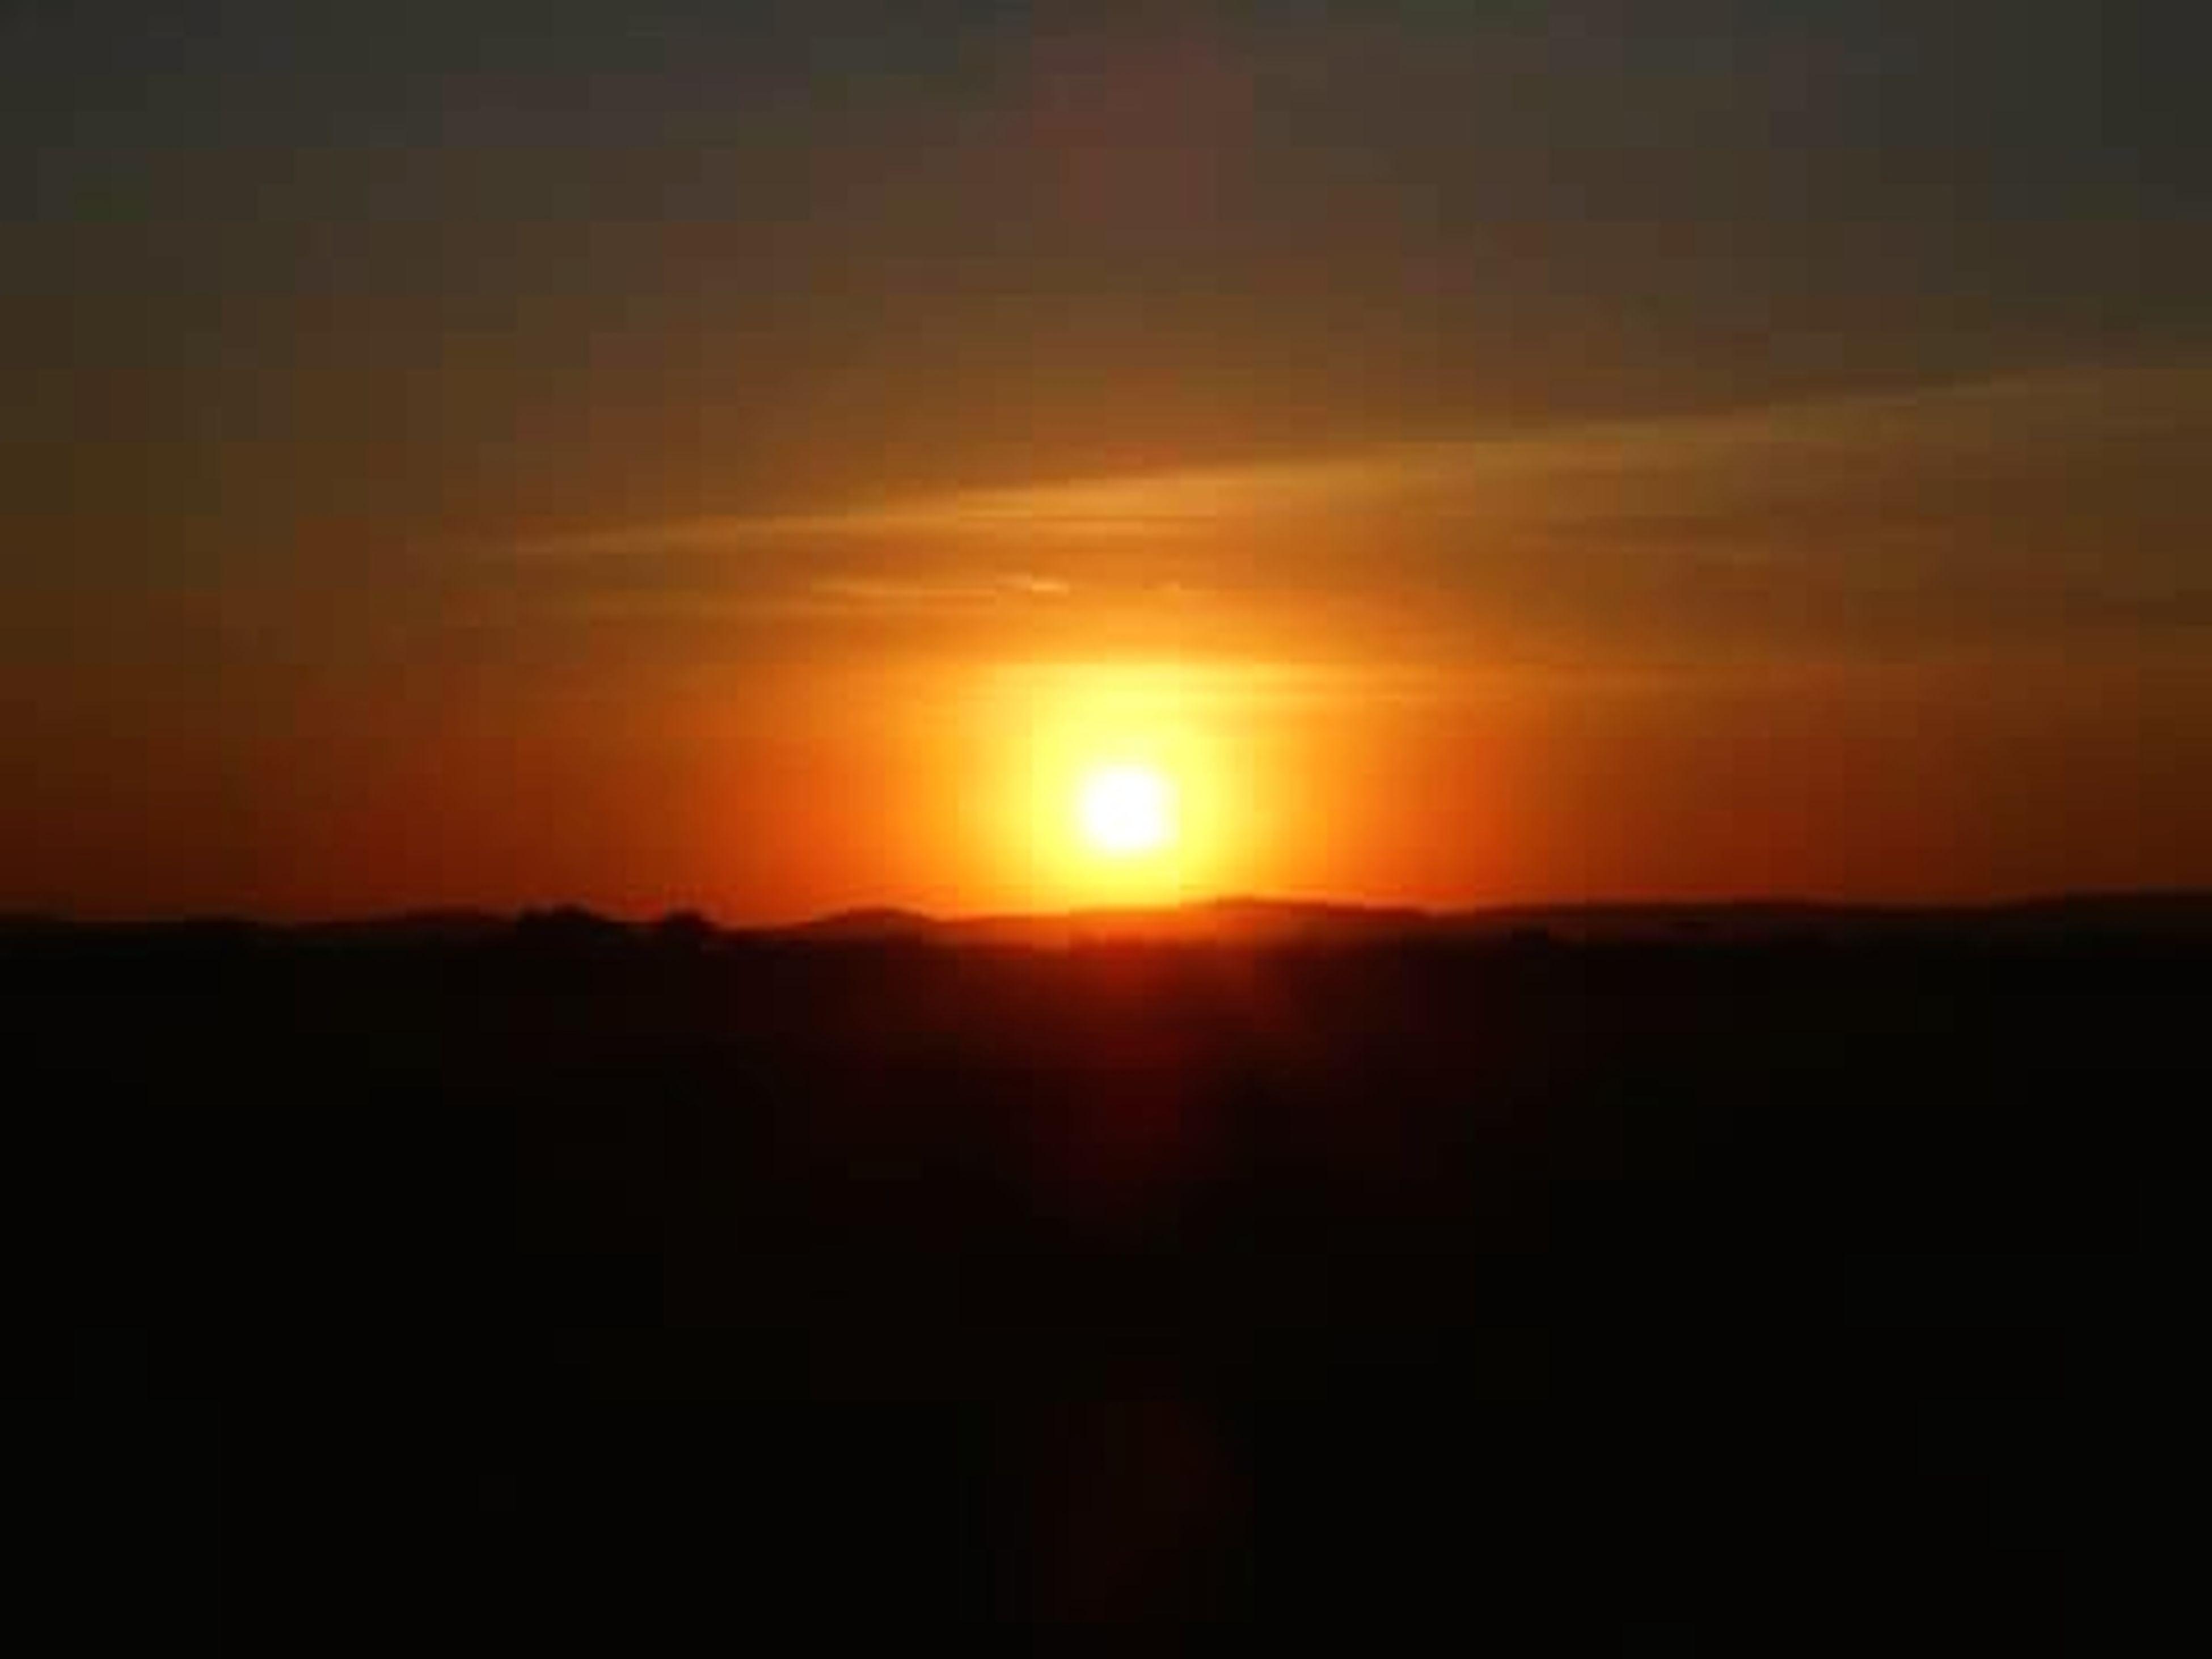 sunset, sun, scenics, tranquil scene, silhouette, tranquility, beauty in nature, orange color, sky, idyllic, landscape, nature, mountain, sunlight, majestic, copy space, dark, outdoors, dramatic sky, cloud - sky